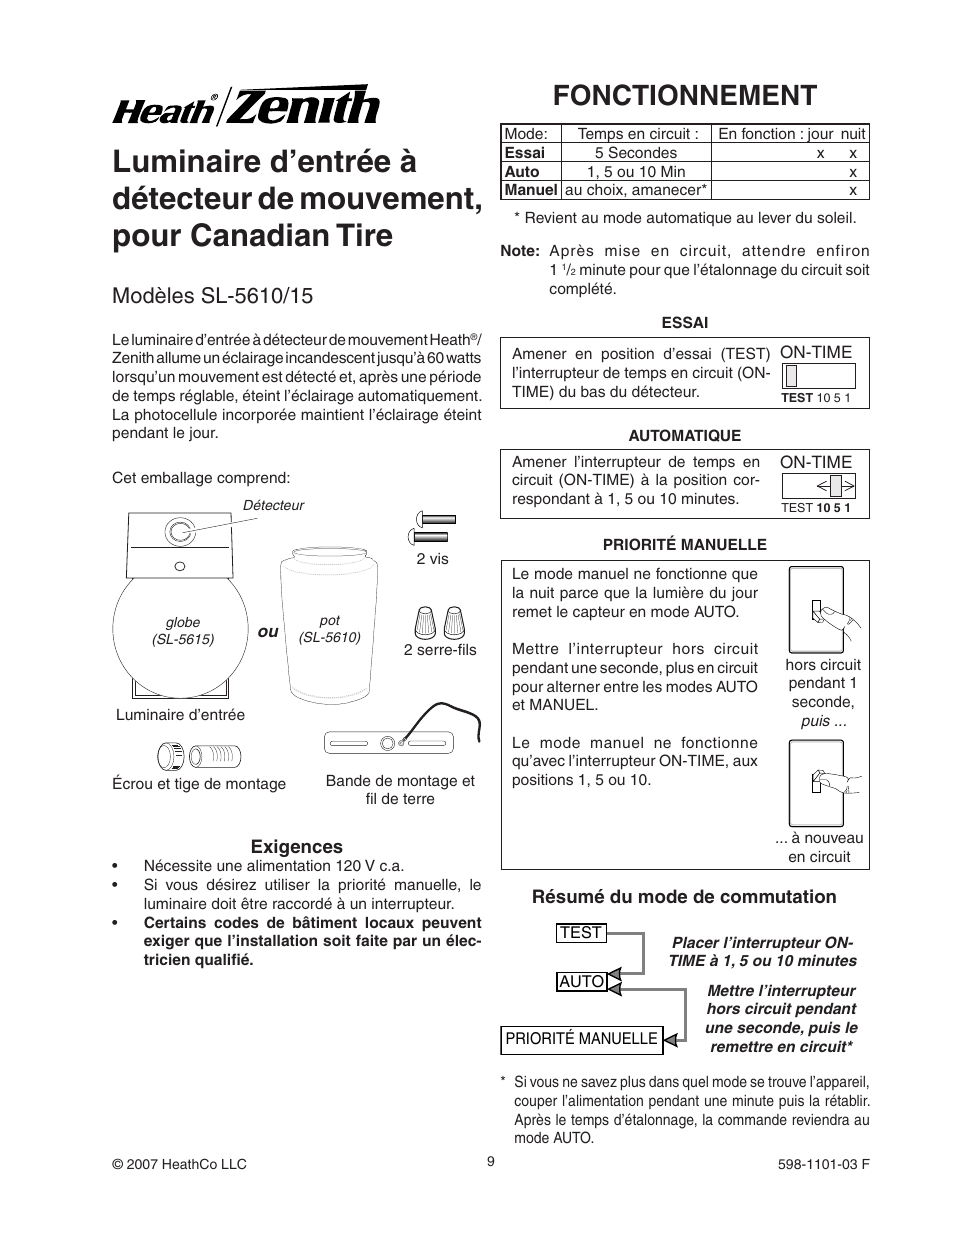 Fonctionnement   Heath Zenith Motion Sensor Entryway Light SL-5610/15 User  Manual  